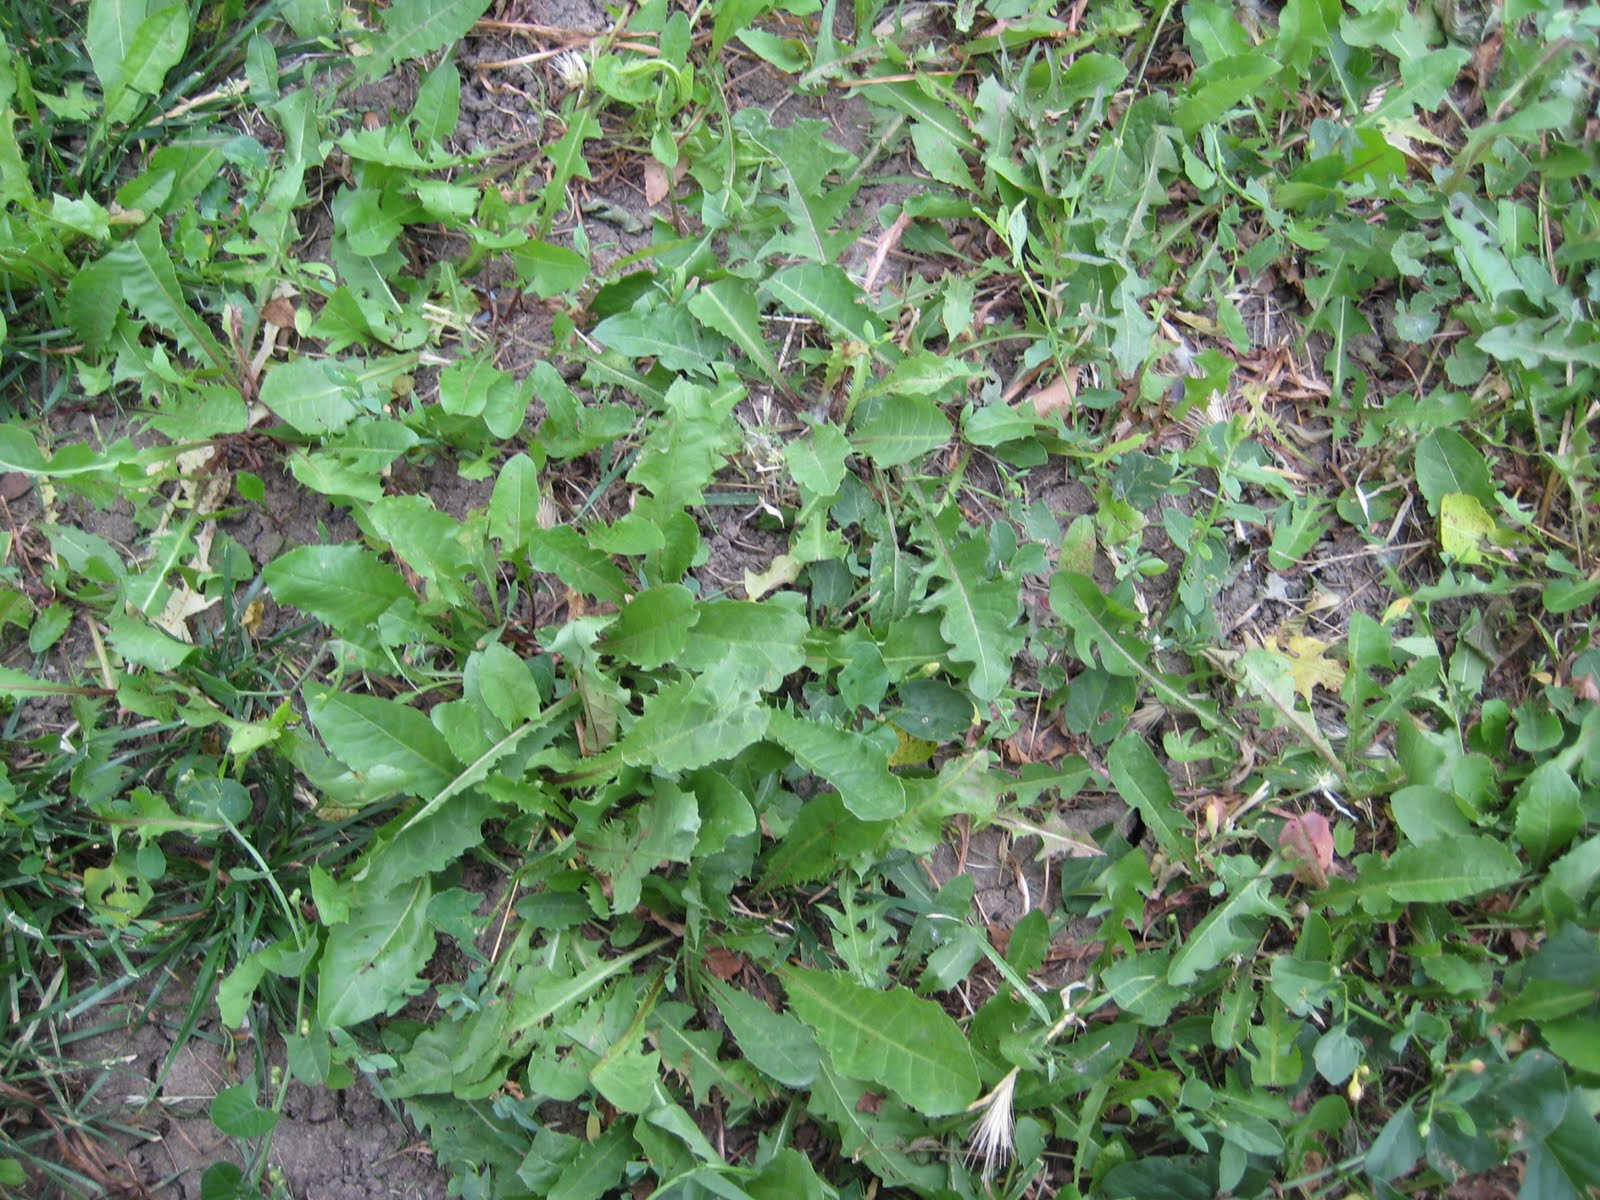 Weed Growing In My Backyard : Gulliville Edible weeds in my yard